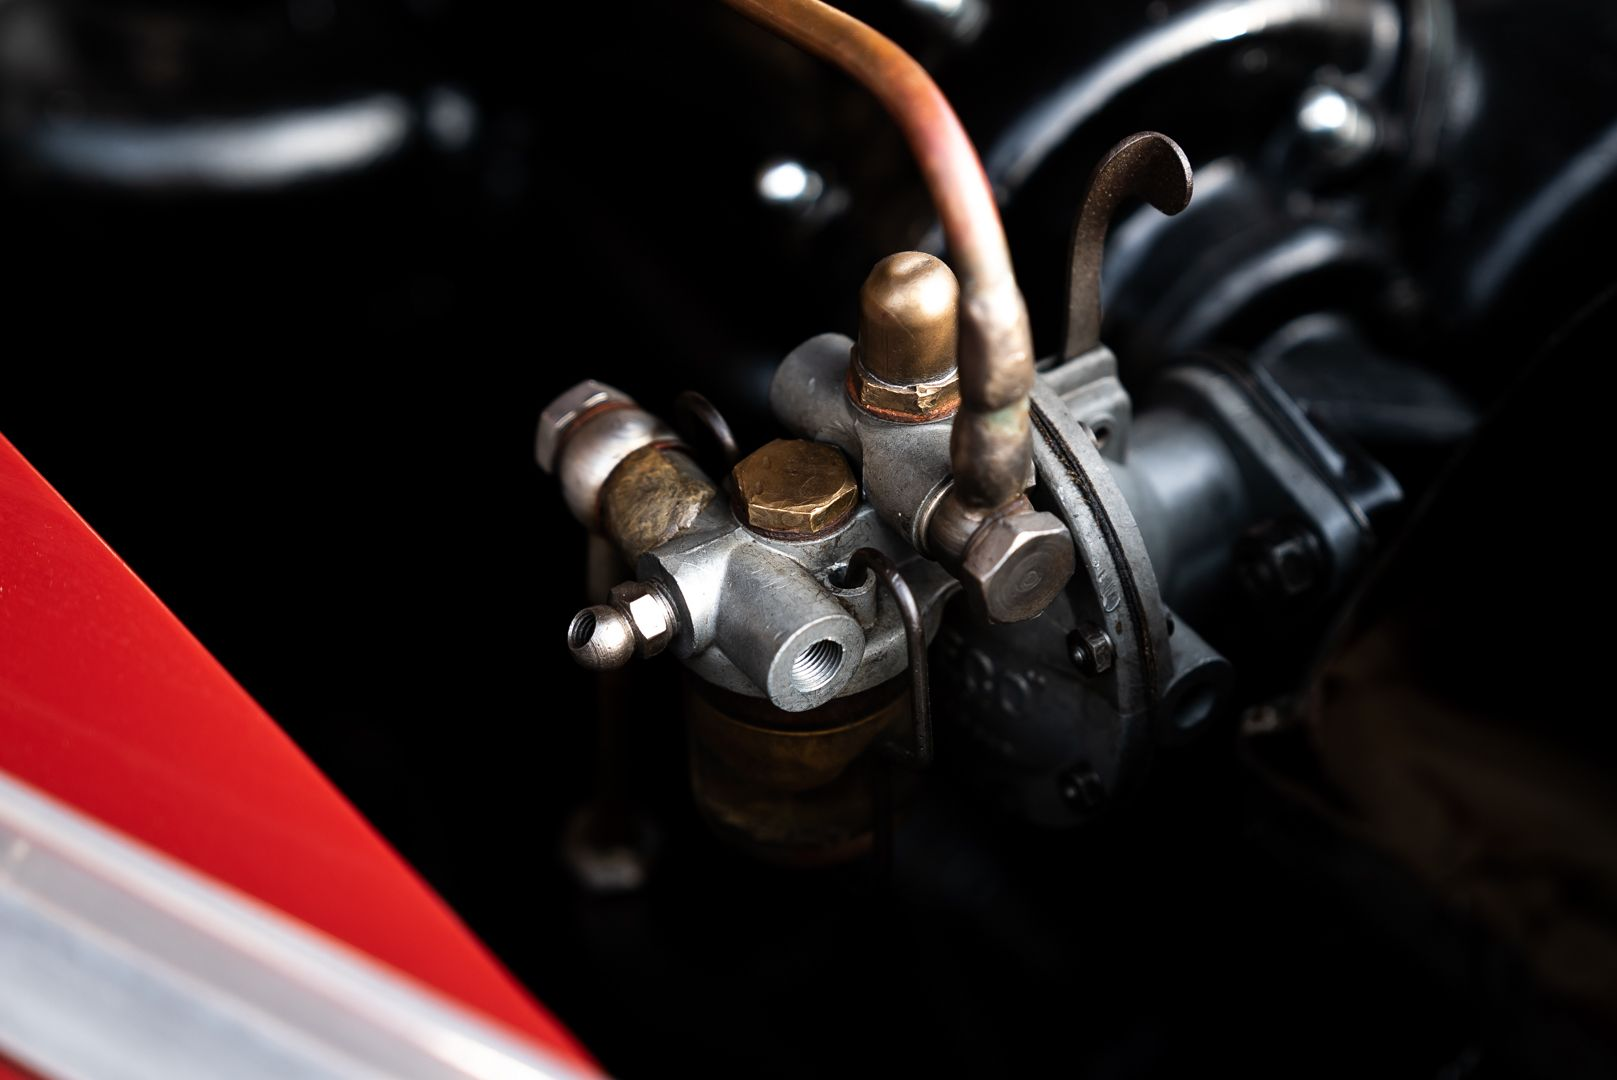 1947 Alfa Romeo Freccia d'oro 6C 2500 Sport 61718